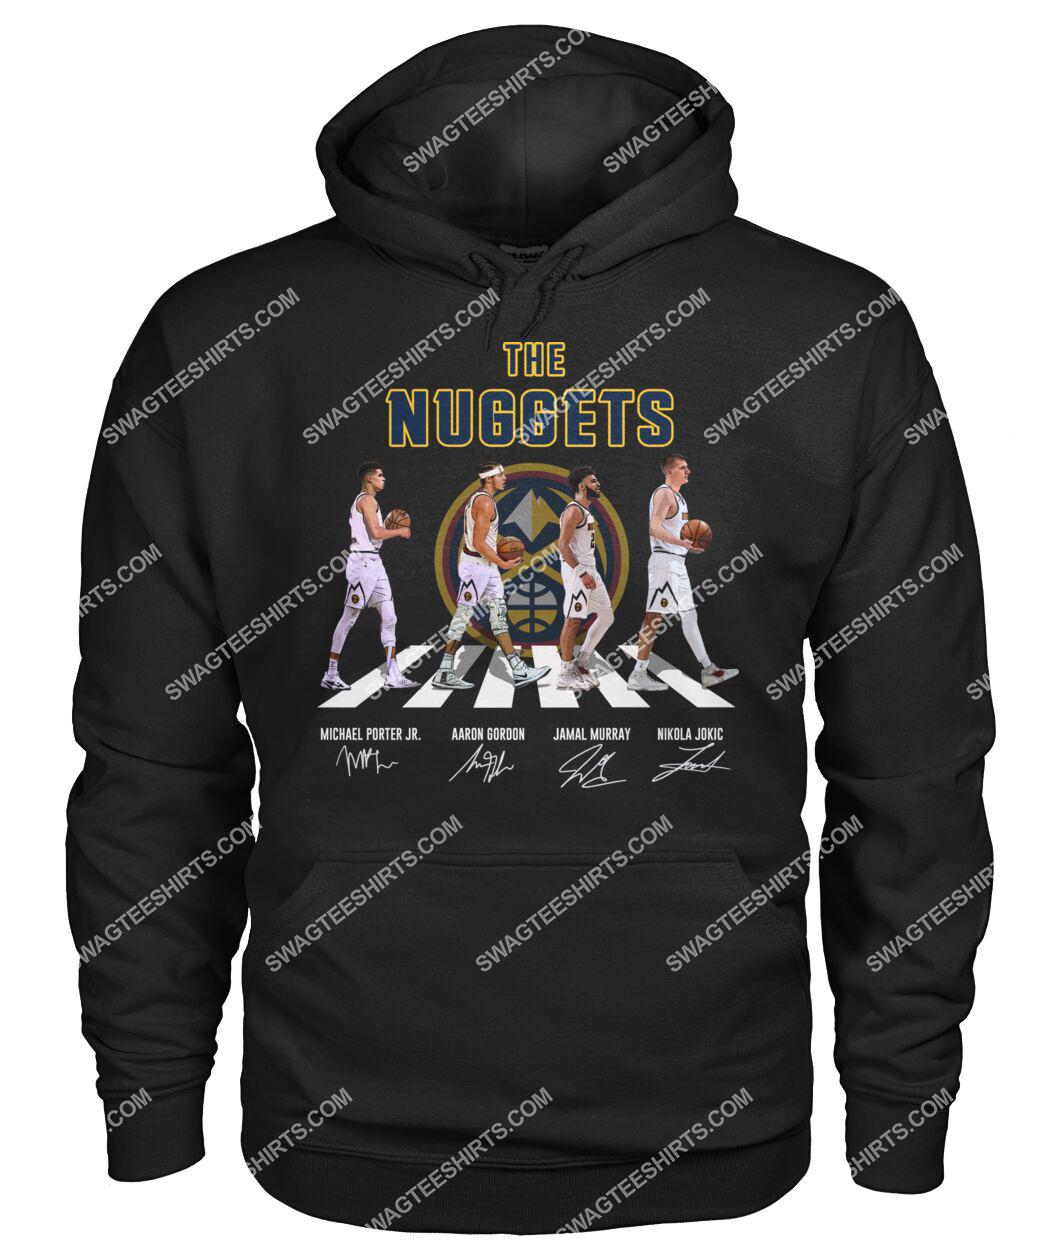 the denver nuggets walking abbey road hoodie 1